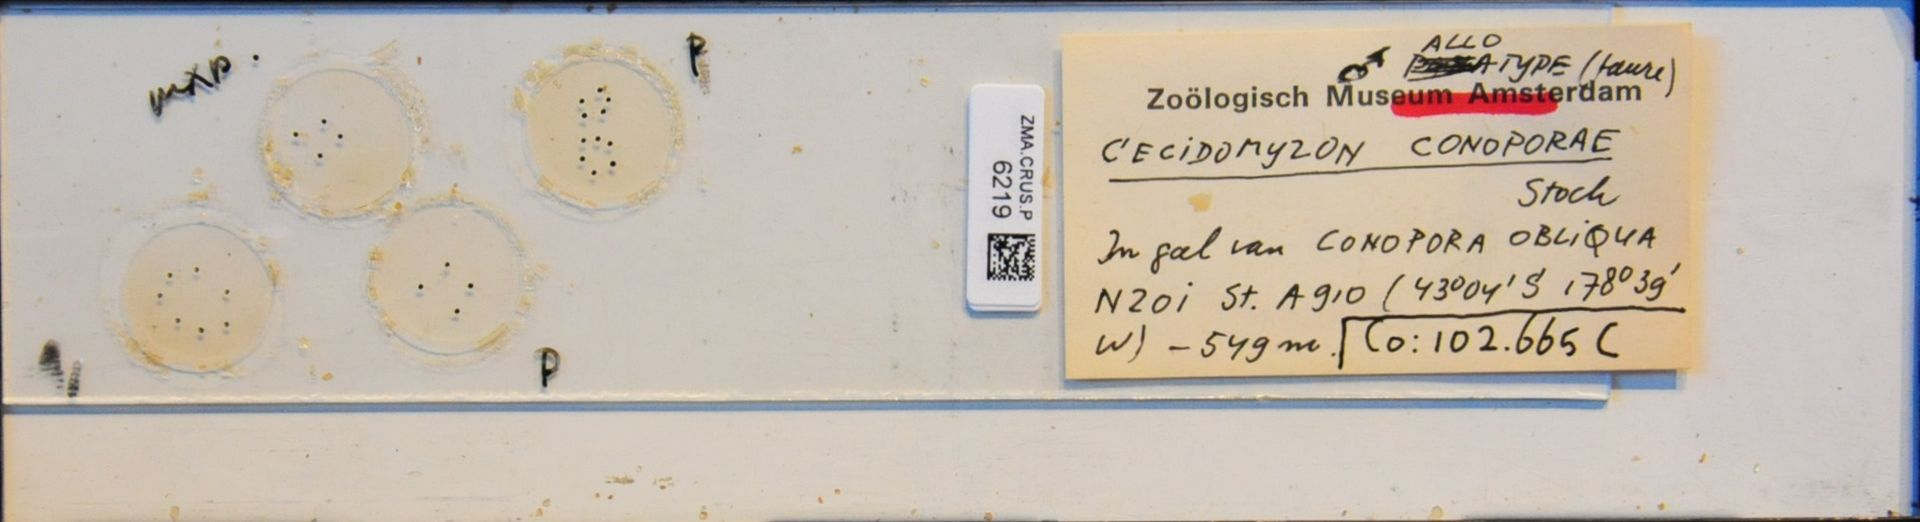 ZMA.CRUS.P.6219 | Cecidomyzon conoporae Stock